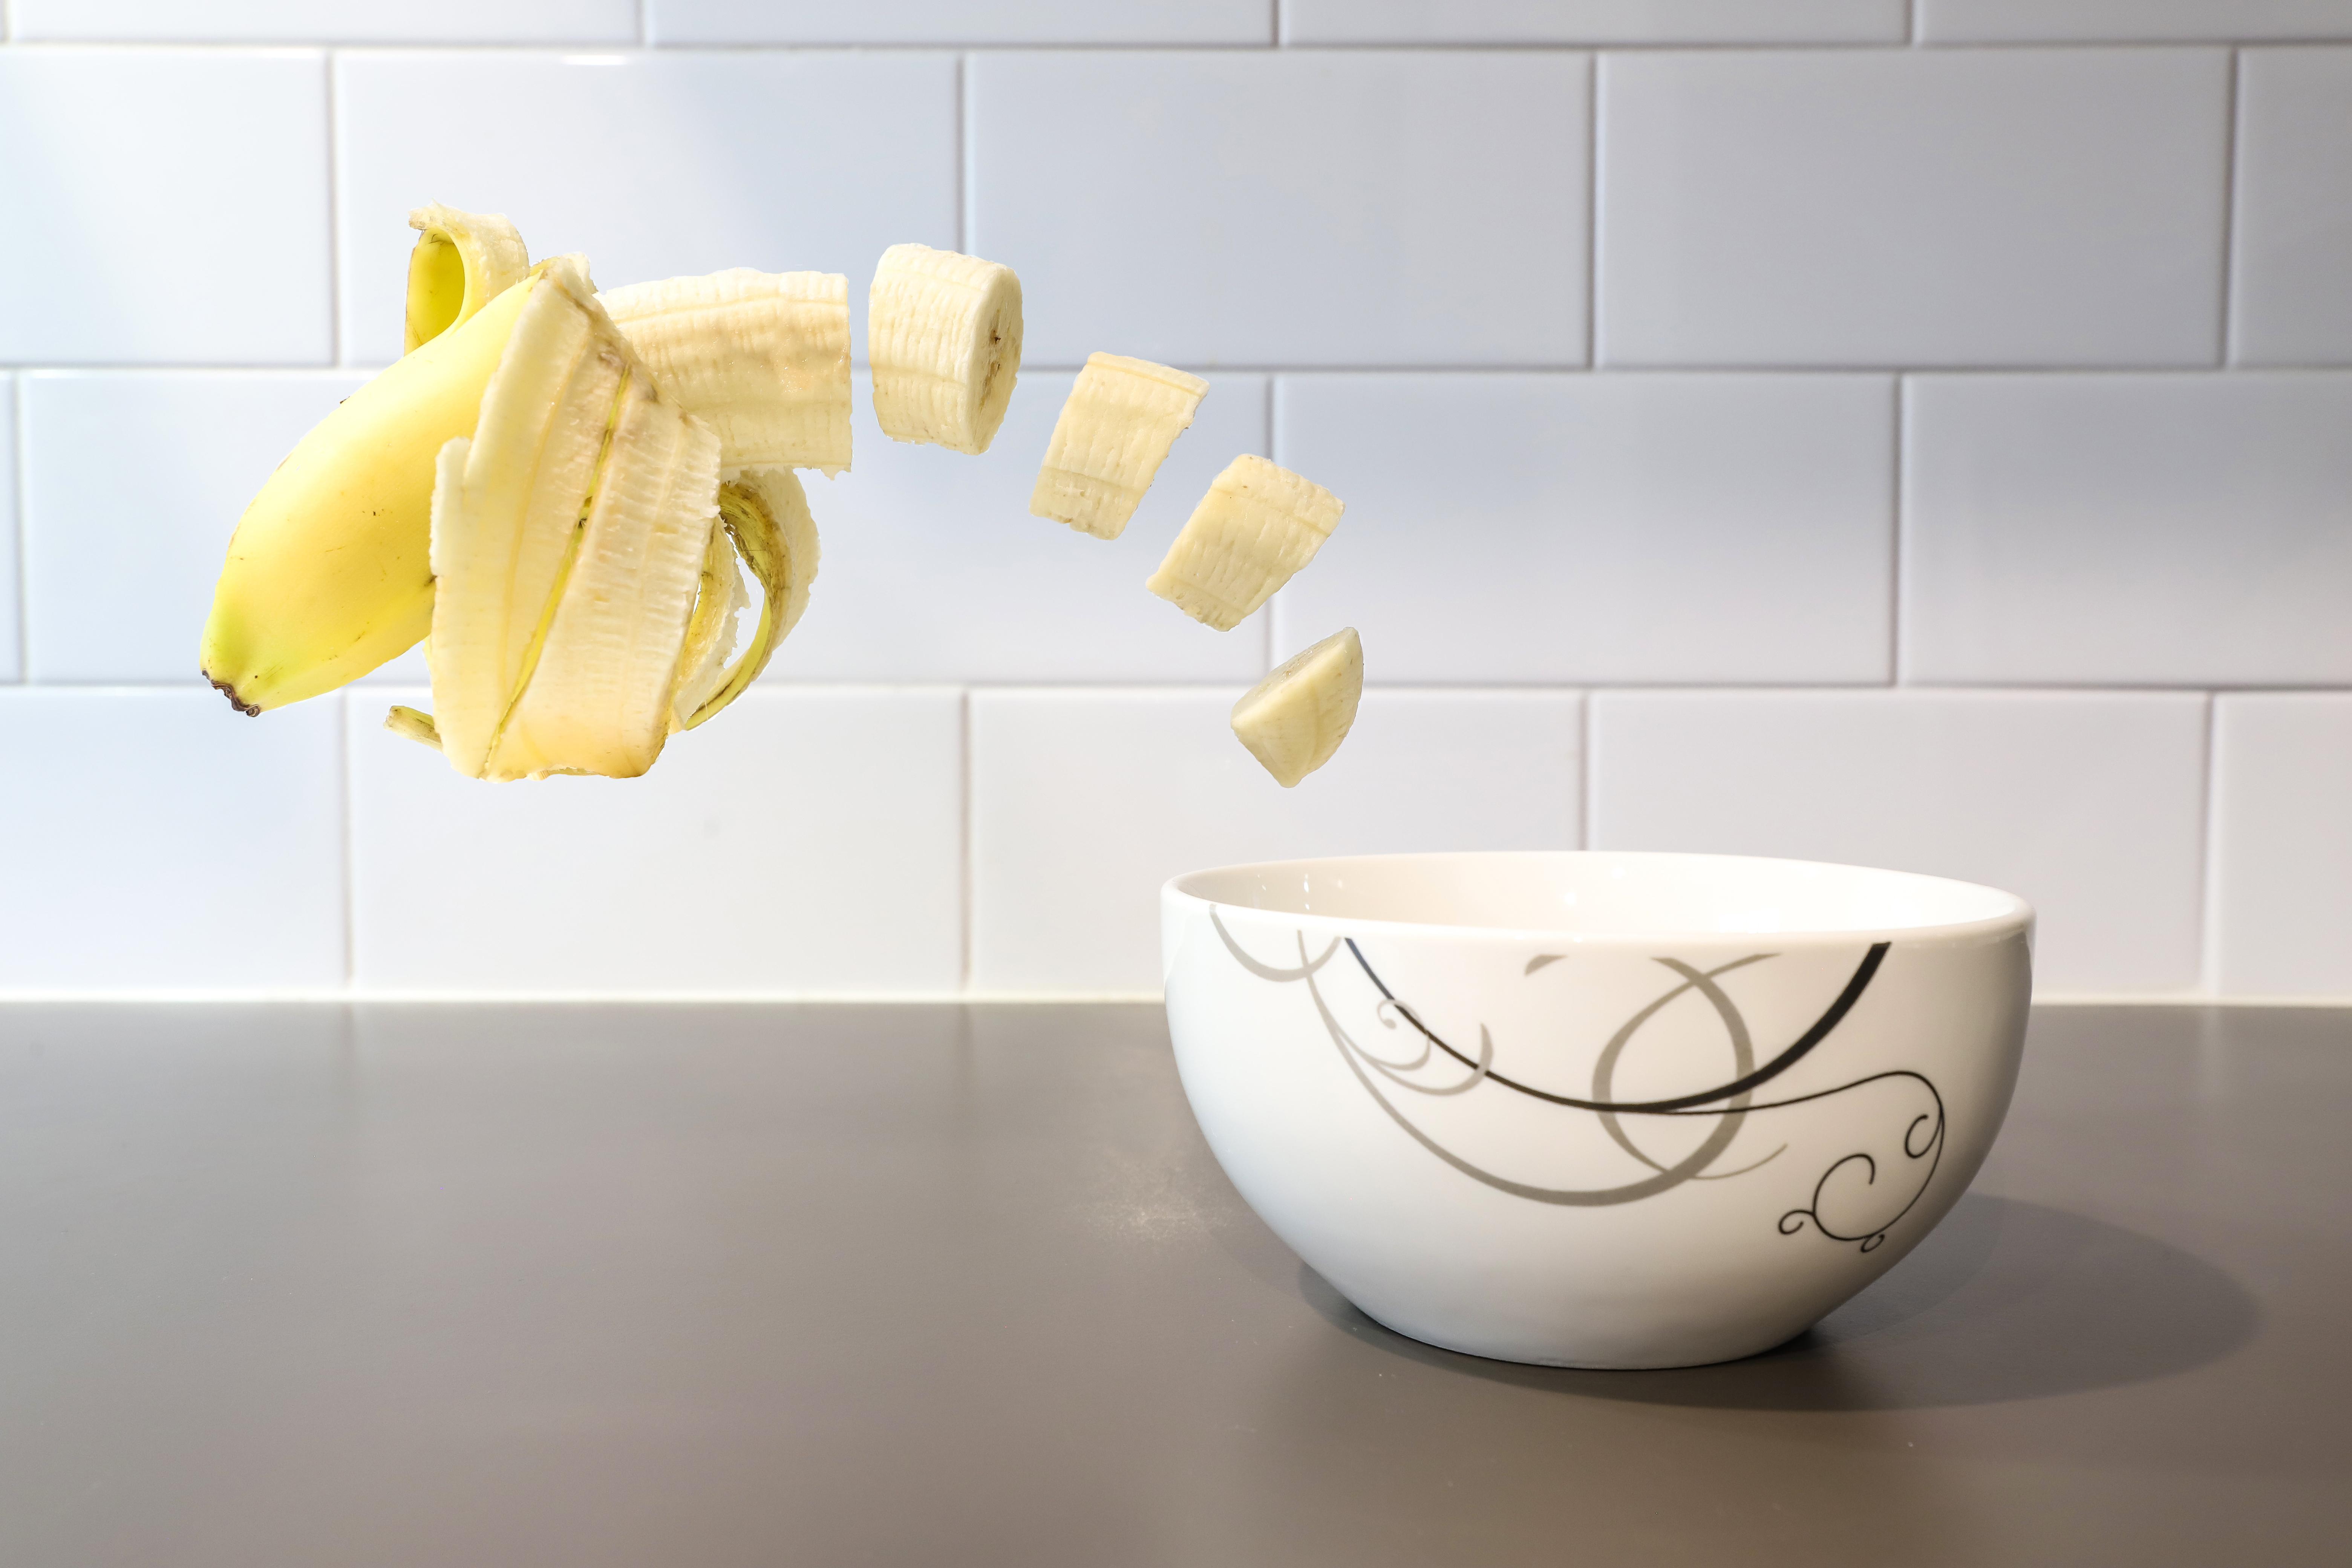 banana 1 Terry Lilley